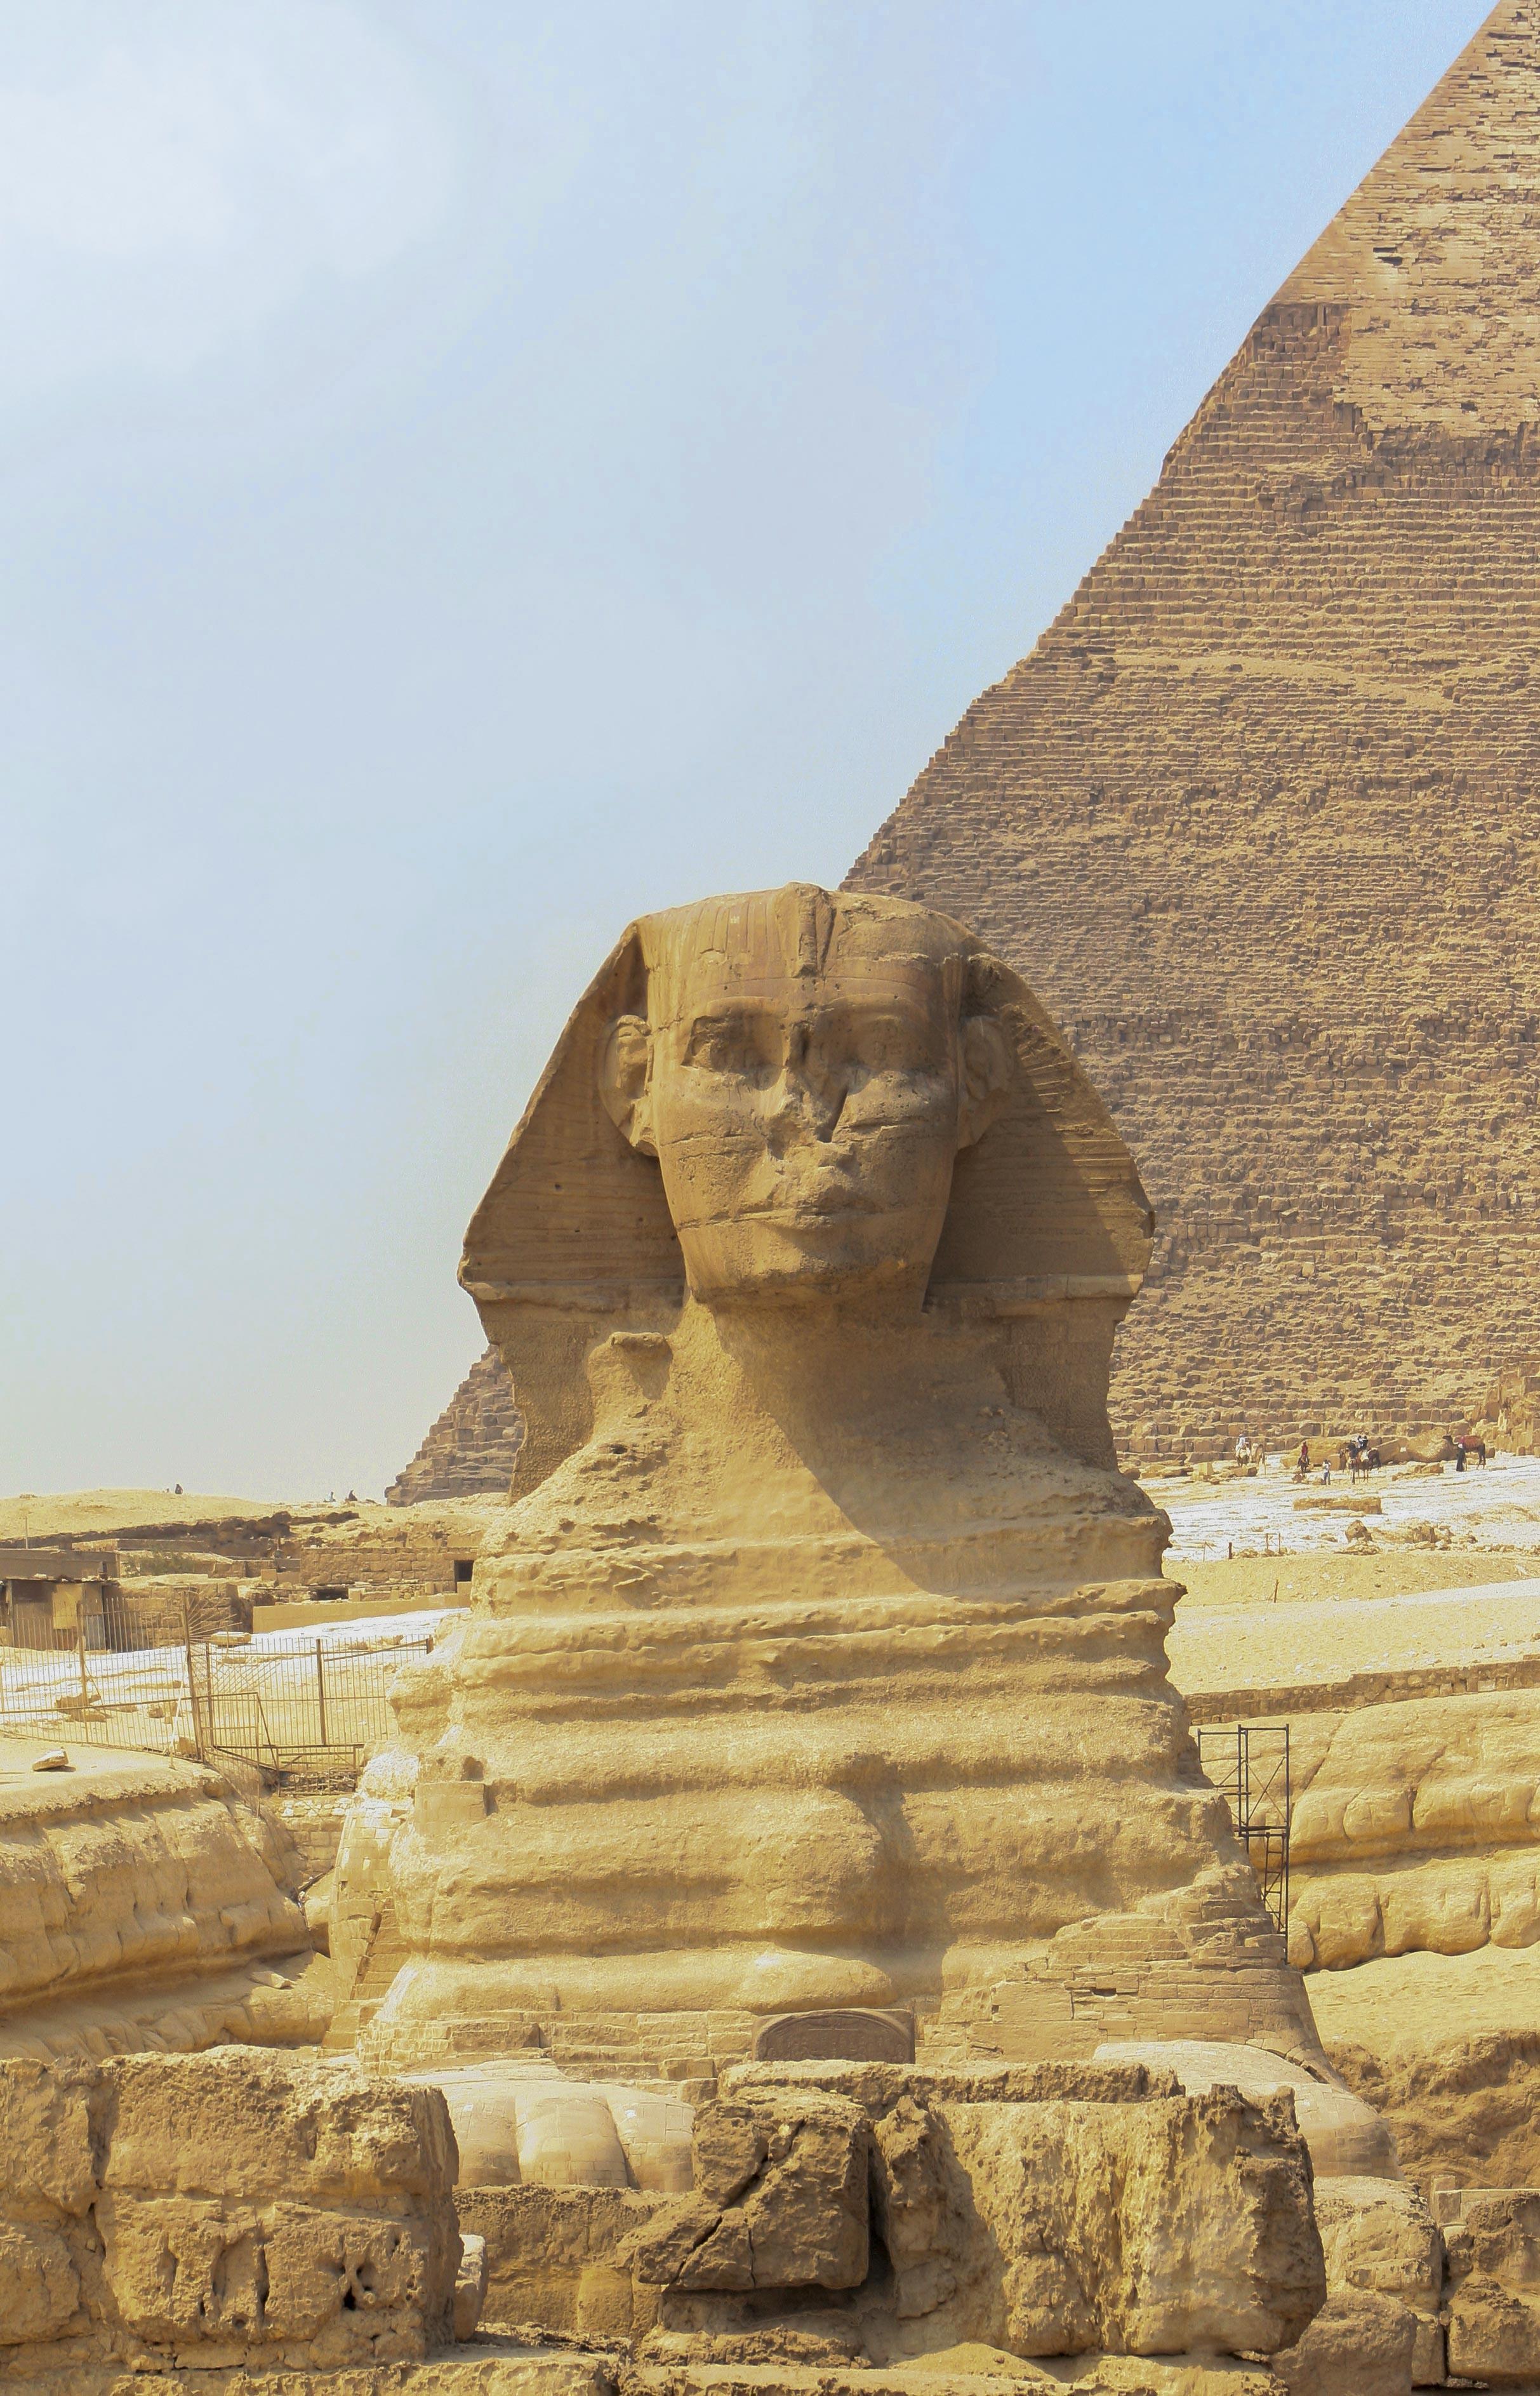 Qui A Construit Les Pyramides : construit, pyramides, Pyramides, Gloire, Pharaon, Lelivrescolaire.fr